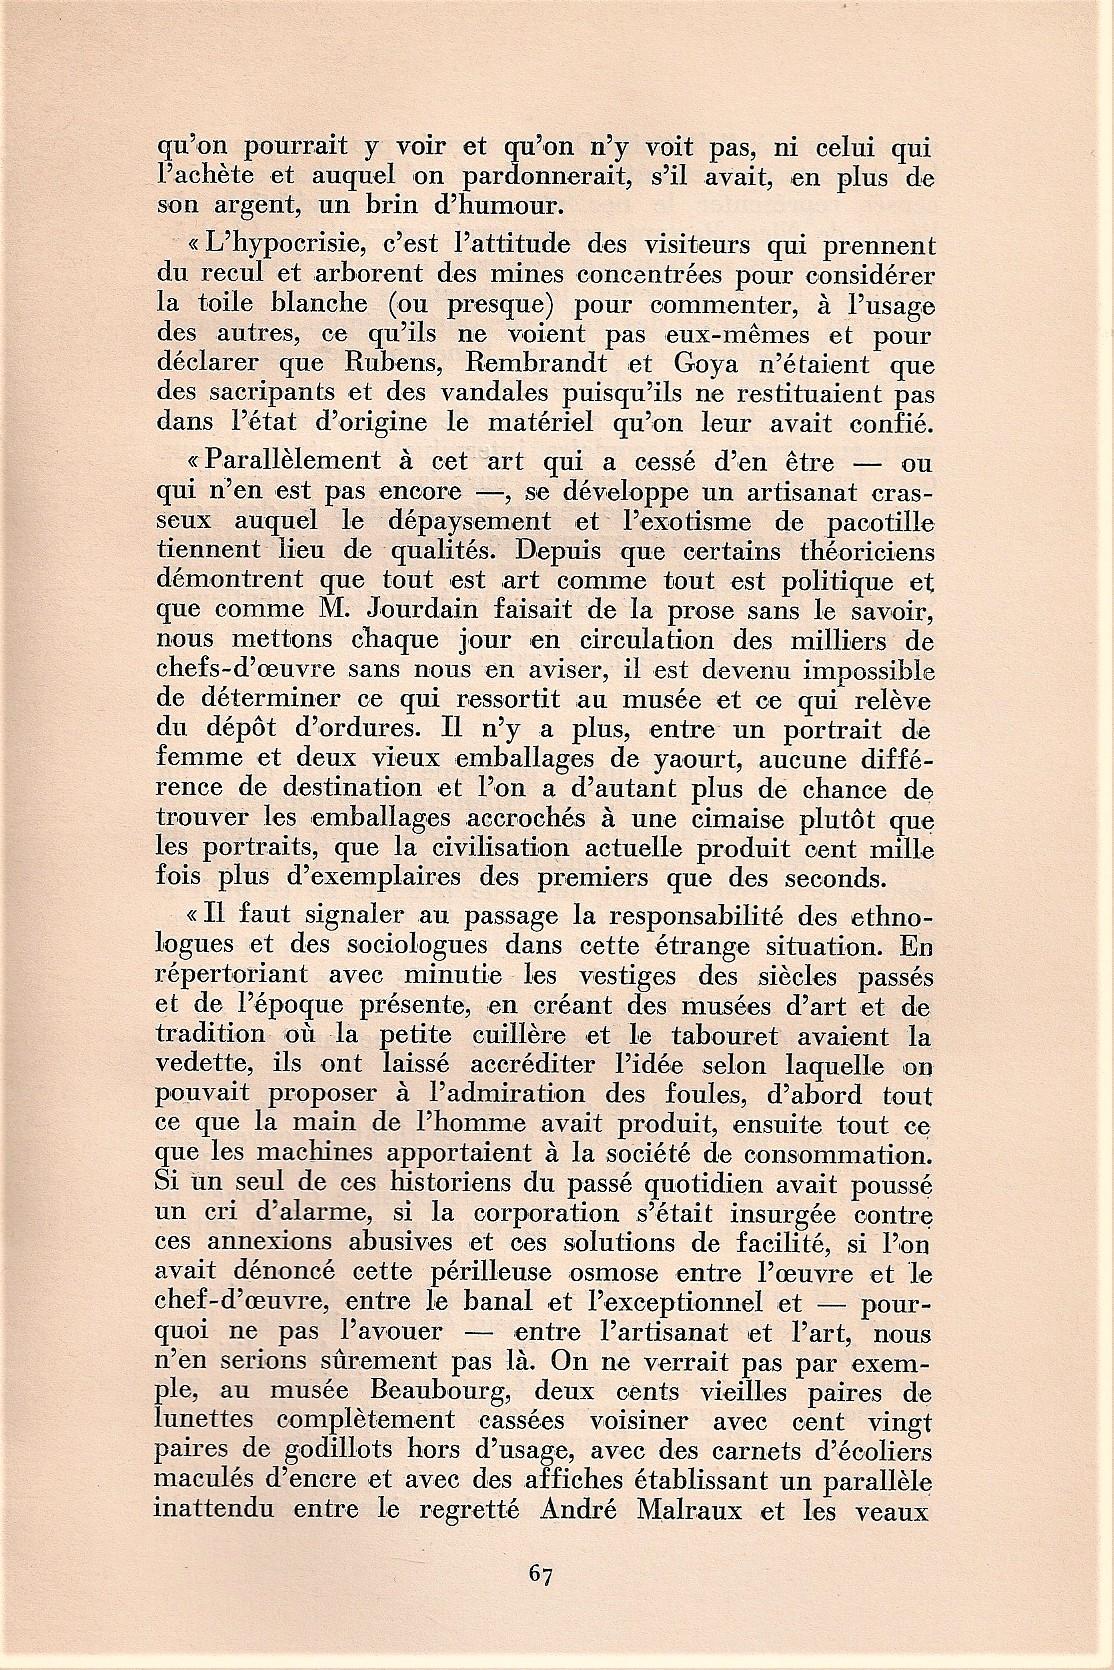 camille-versini-page-67.jpg